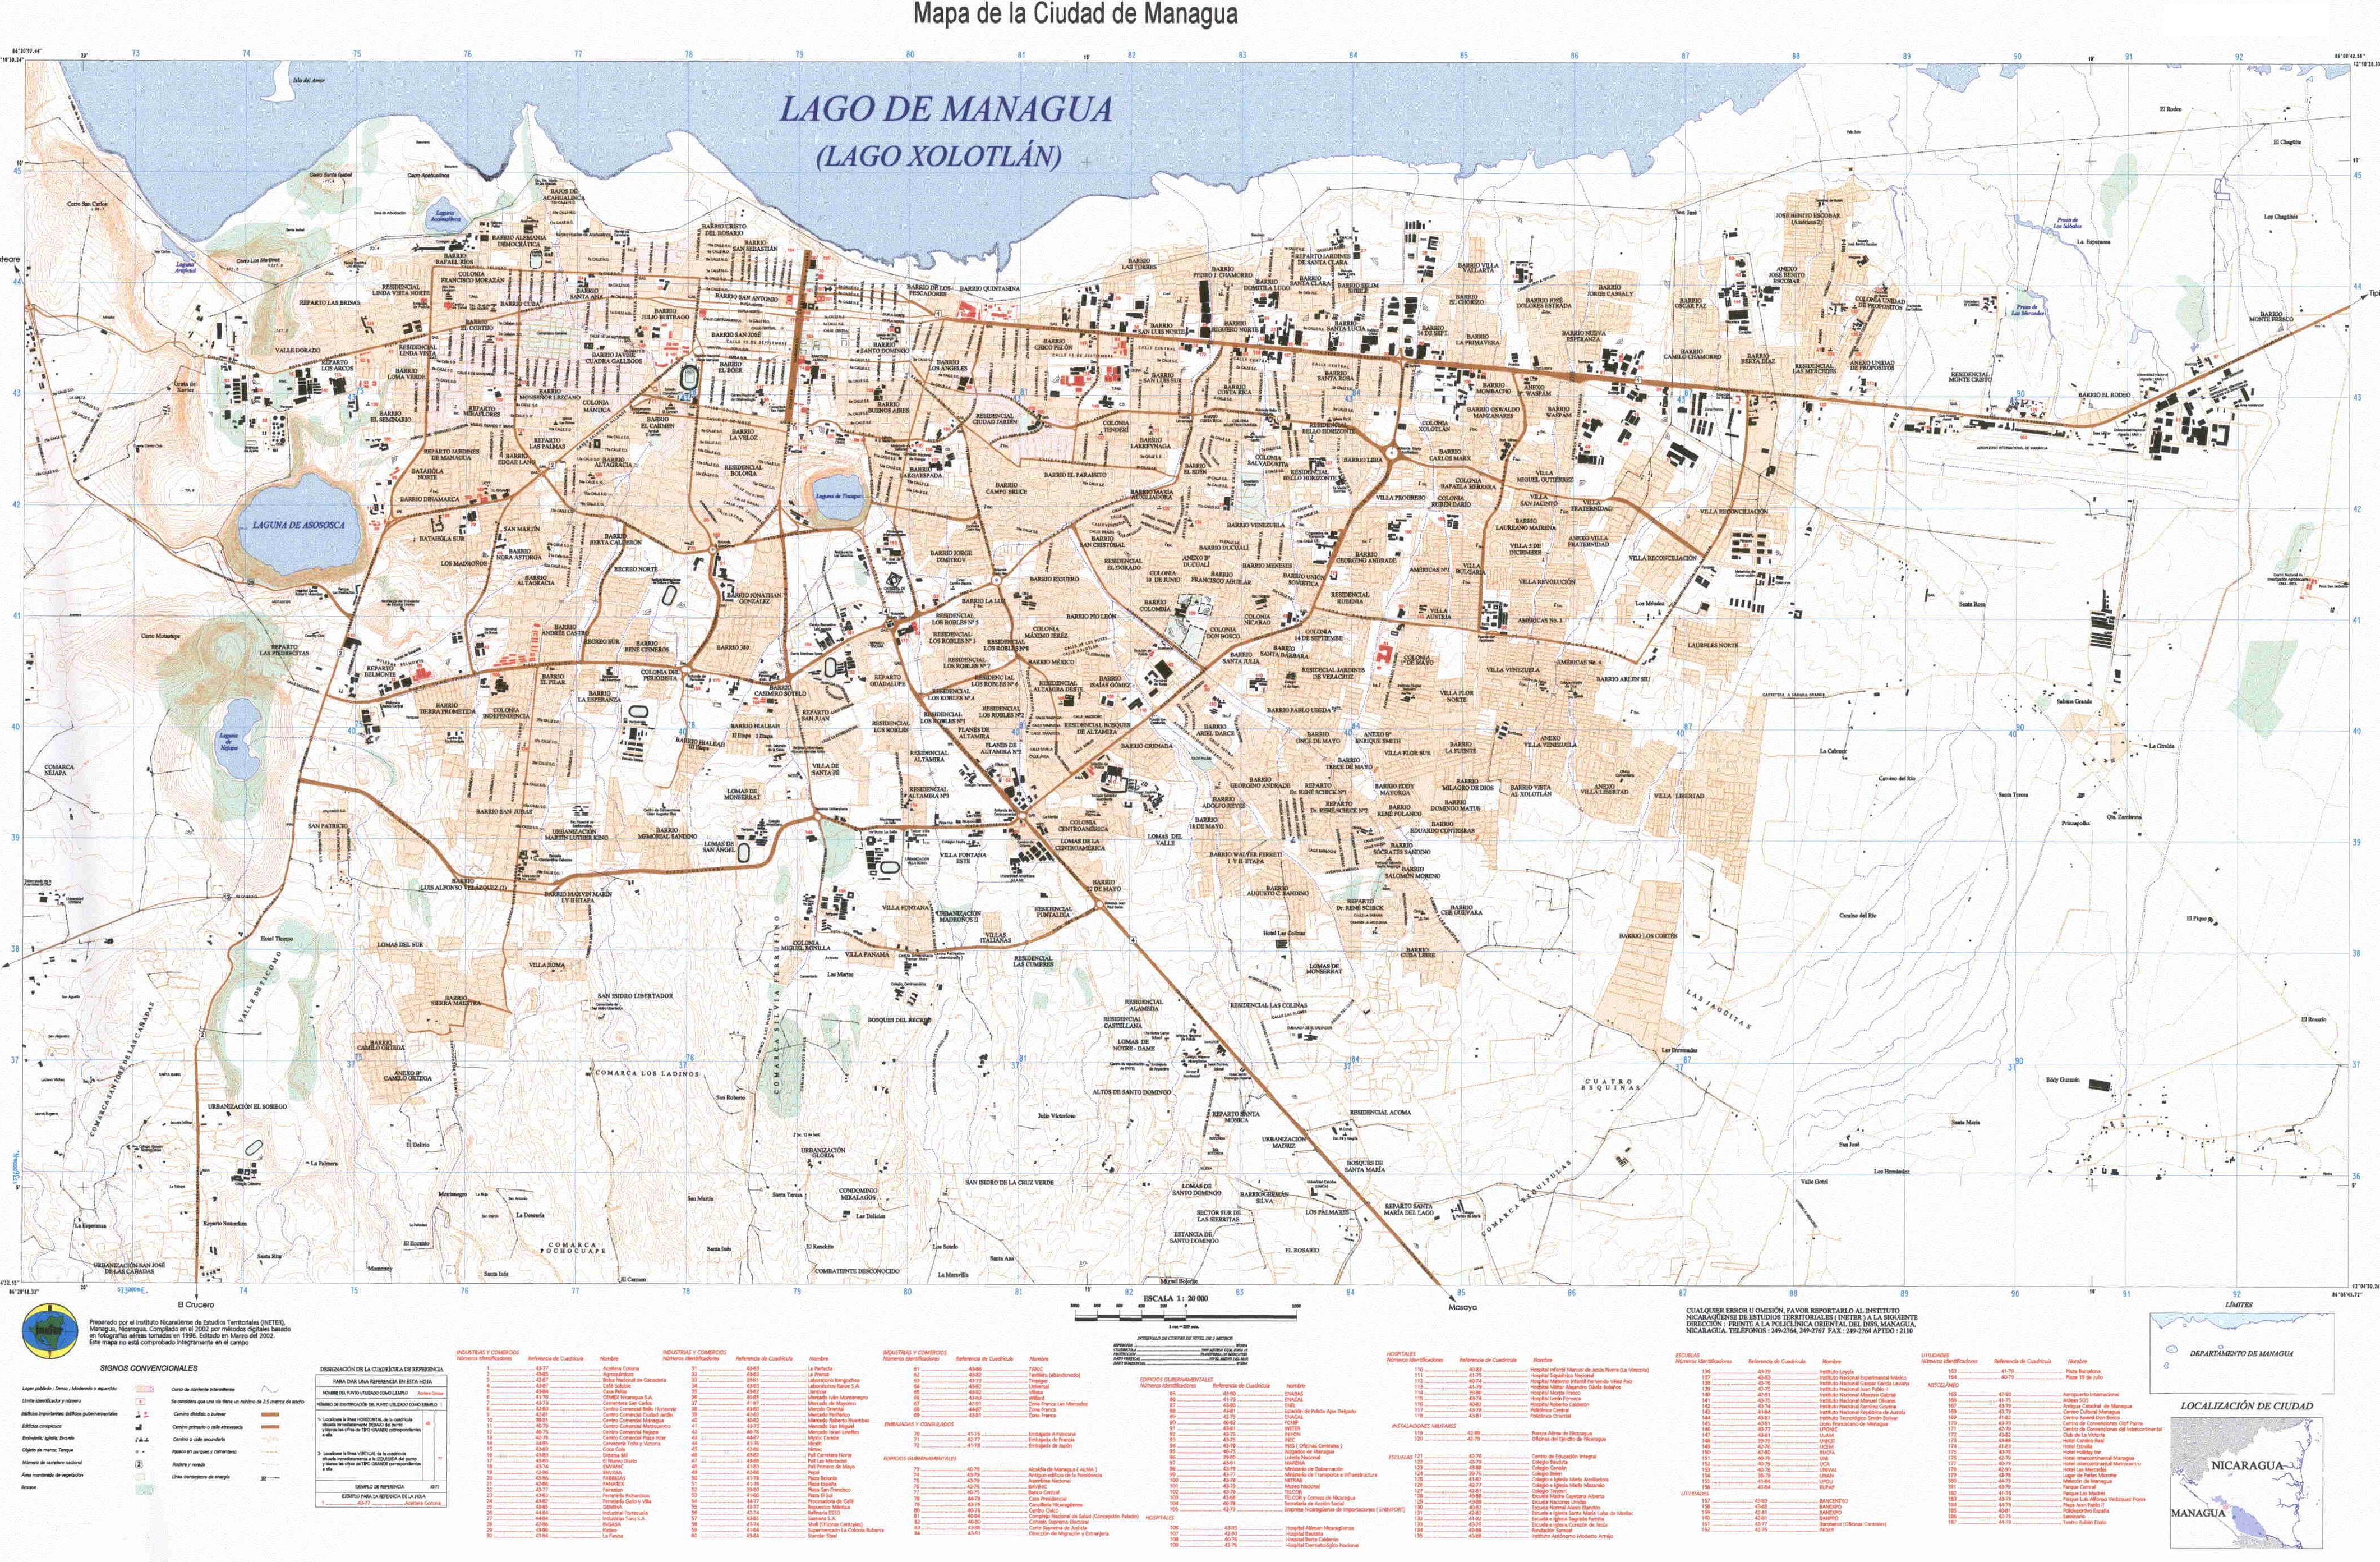 Managua Large Scale Map, Nicaragua